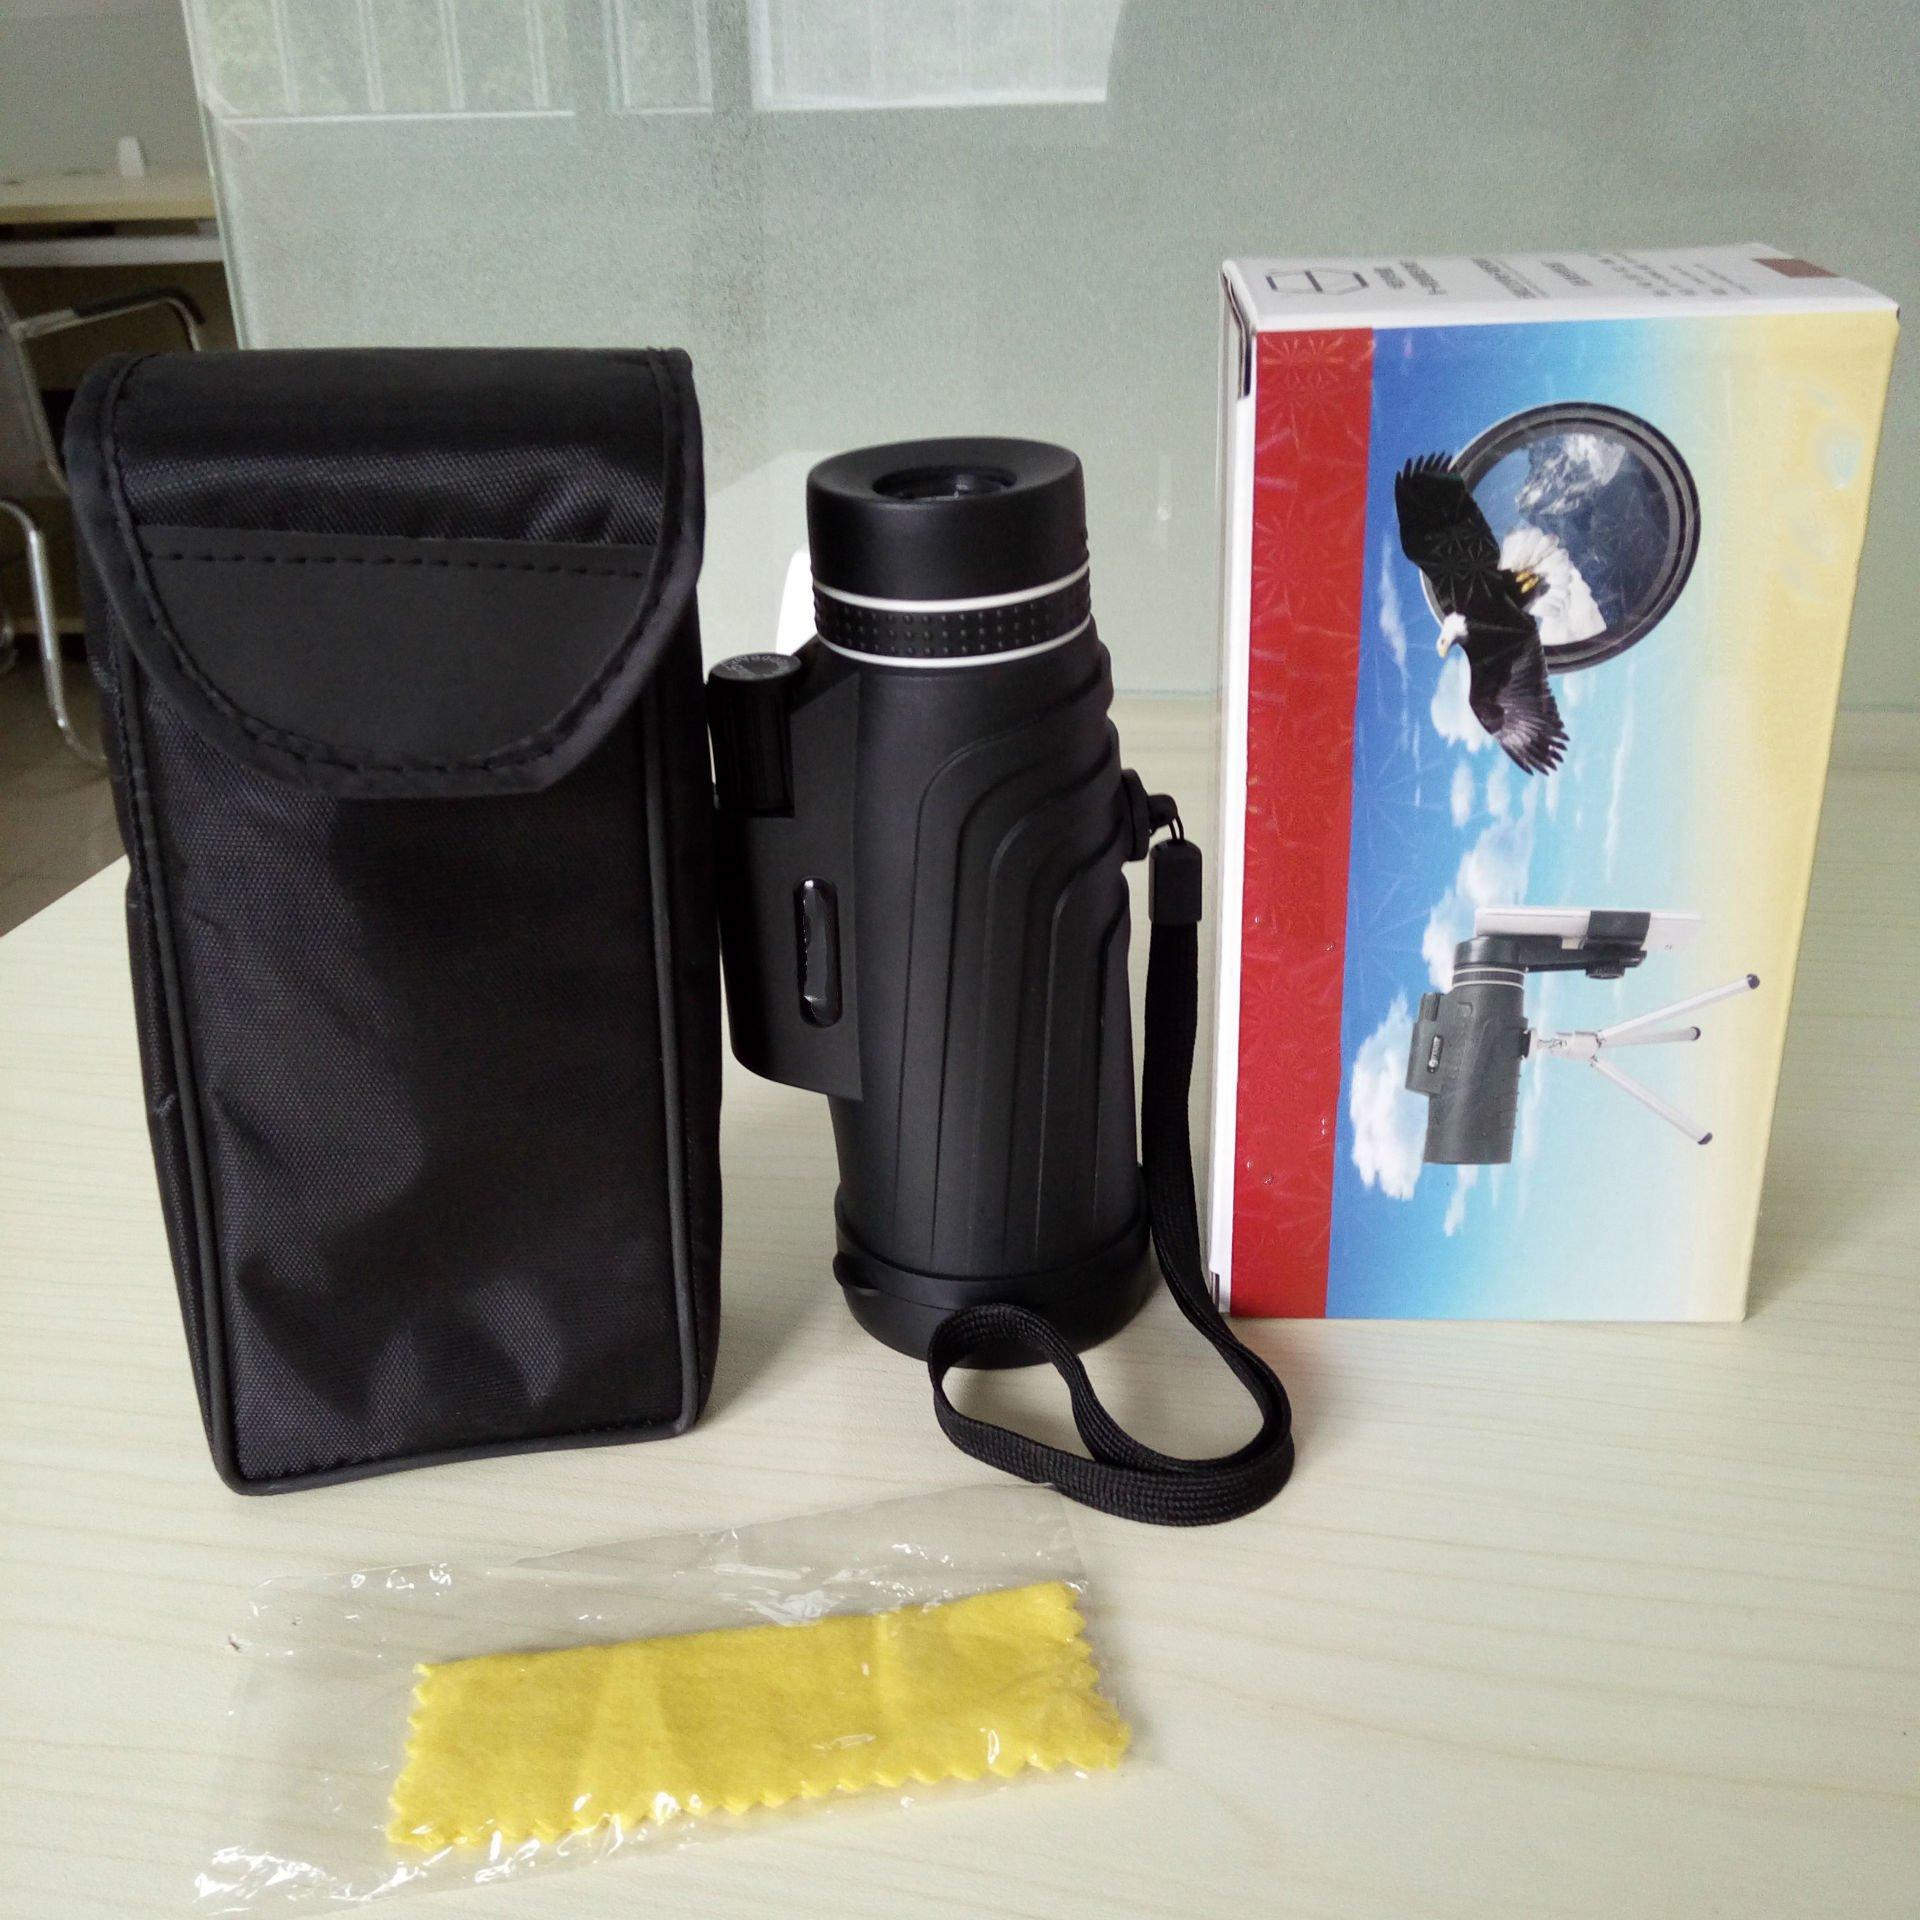 YU 10 × 52 High-Power Monocular Binoculars Outdoor Travel Portable Mobile Phone Camera Glasses,Black